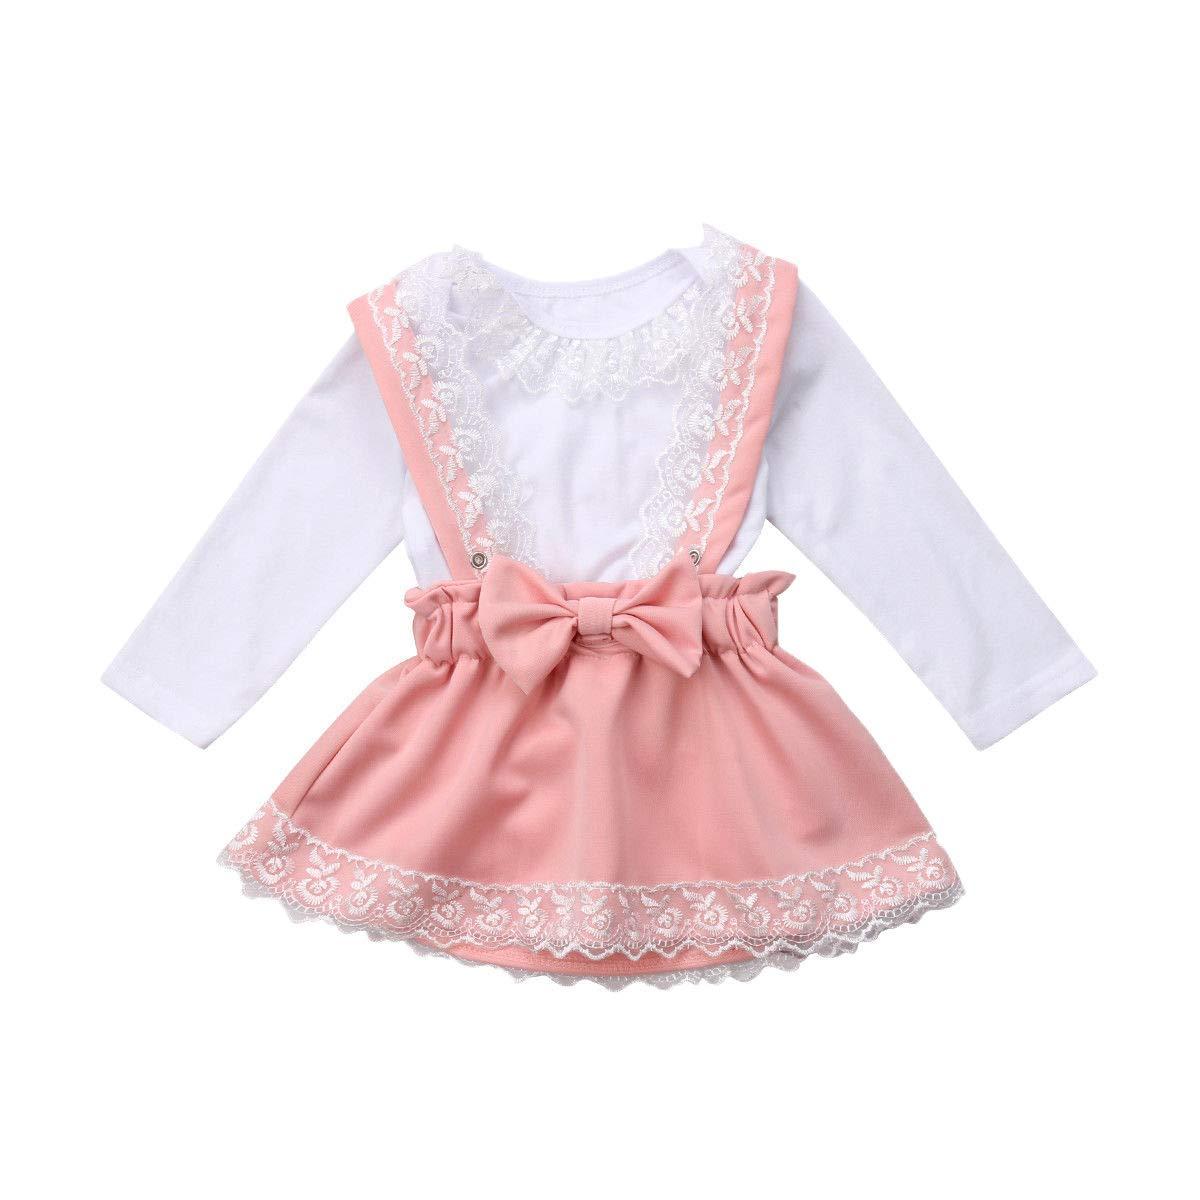 281e3cc41 Get Quotations · Baby Girl Skirt Set Lace Collar Romper Bodysuit Suspender  Bowknot Overalls Skirt